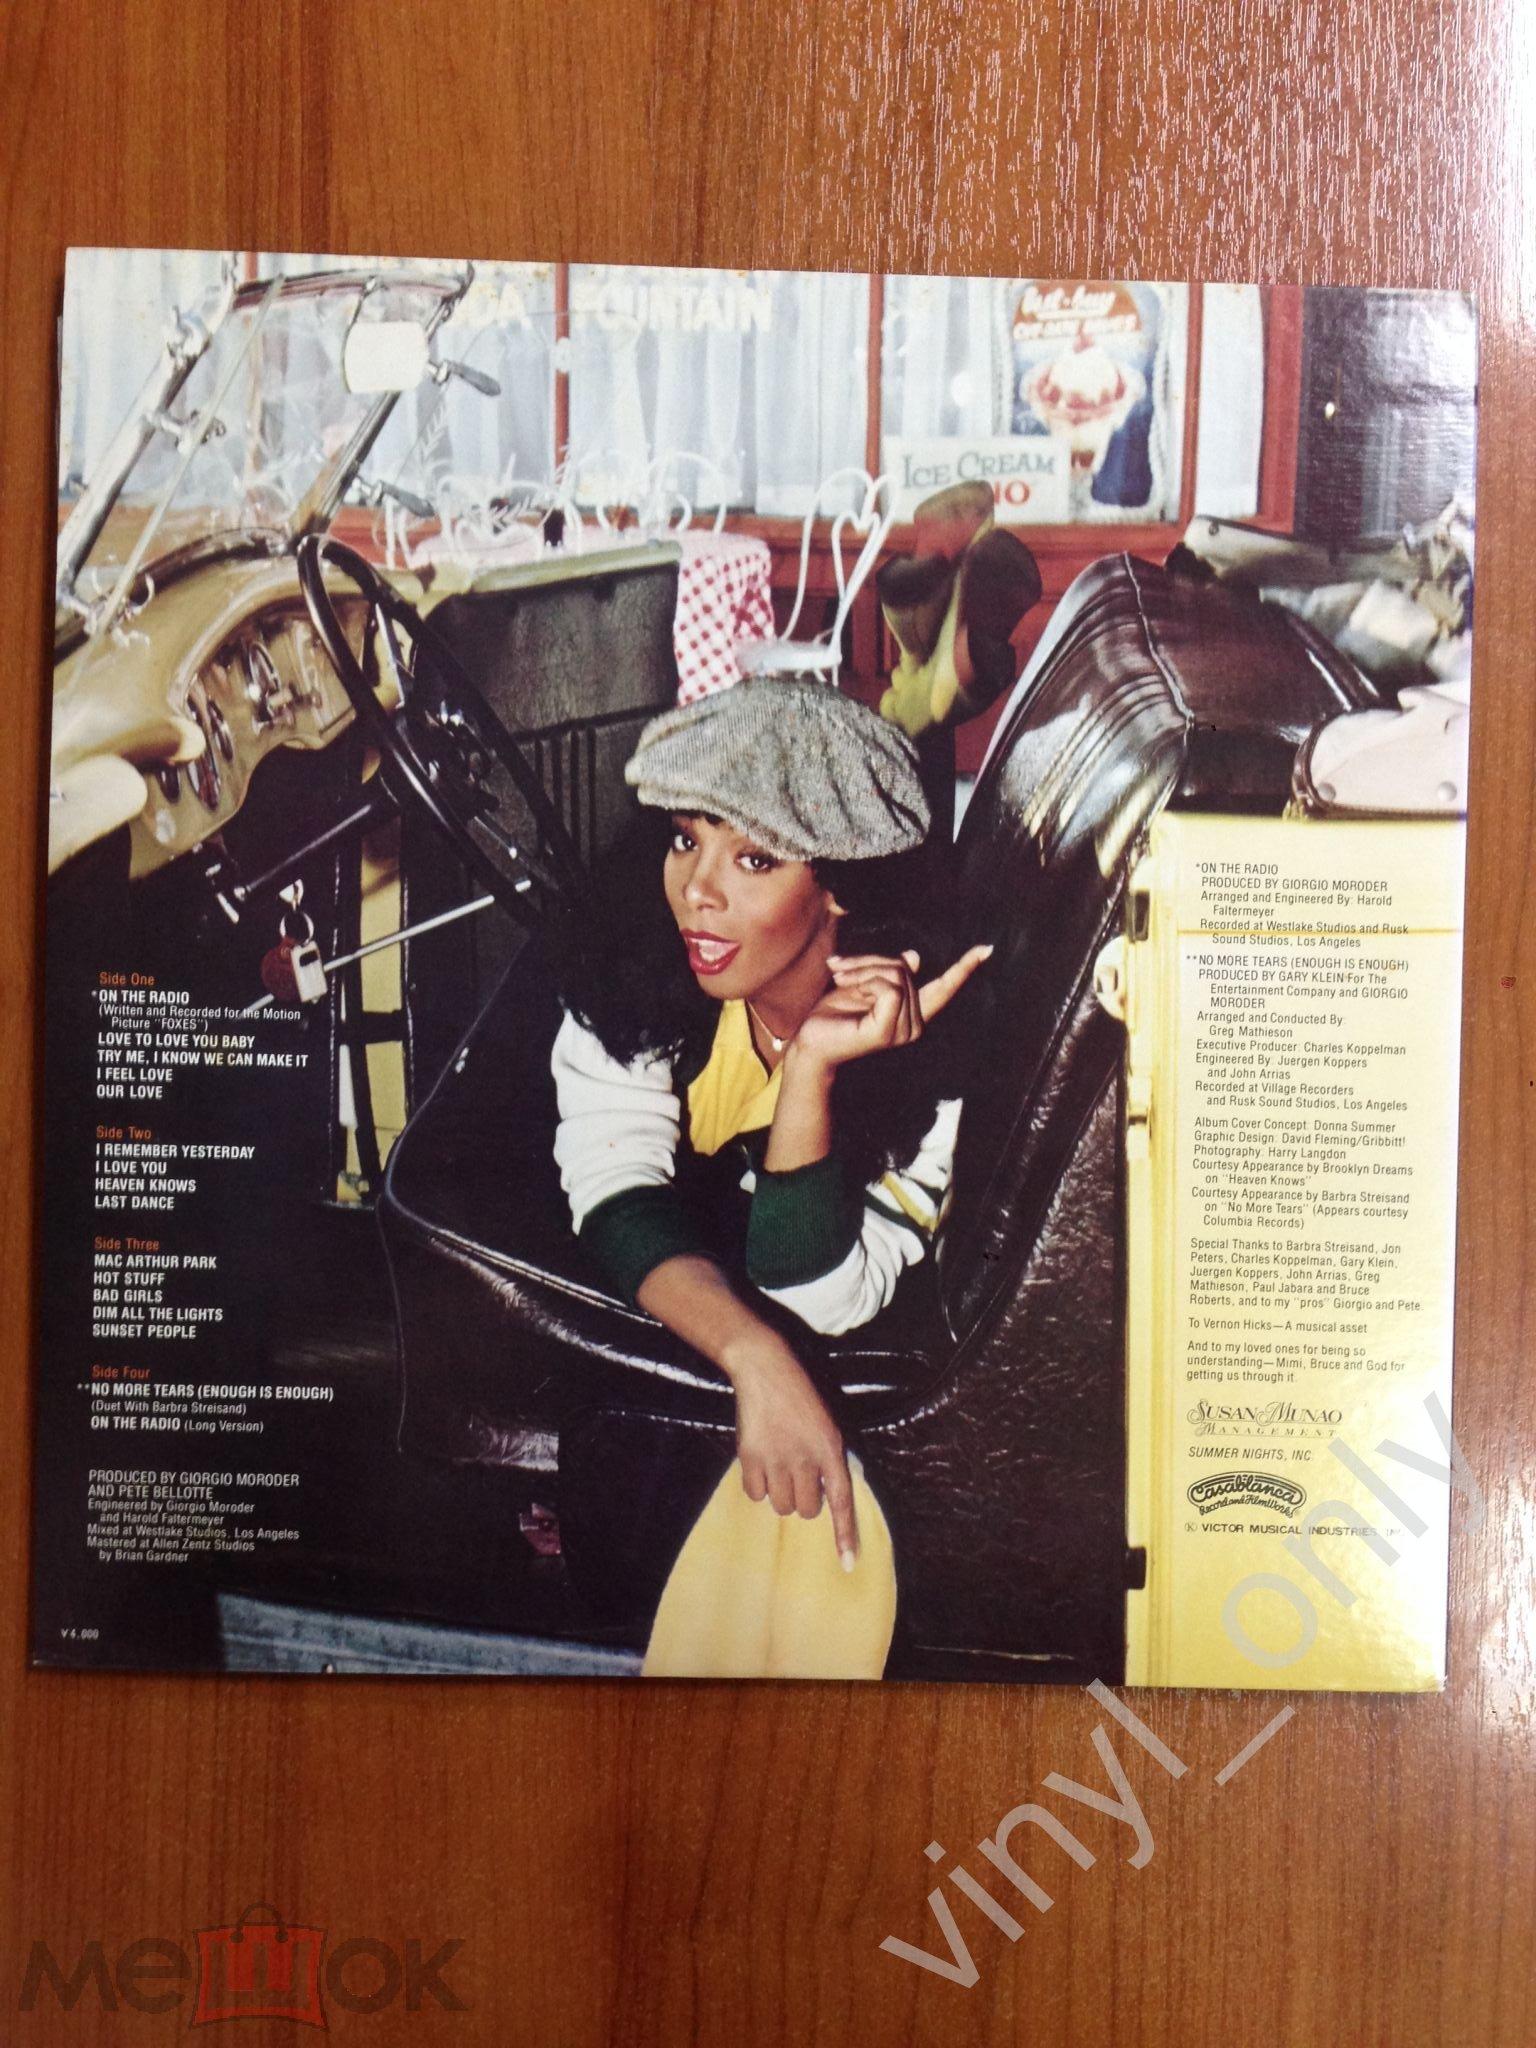 LP Donna Summer – On The Radio - Greatest Hits Vol  I & II 1979 Casablanca  Japan